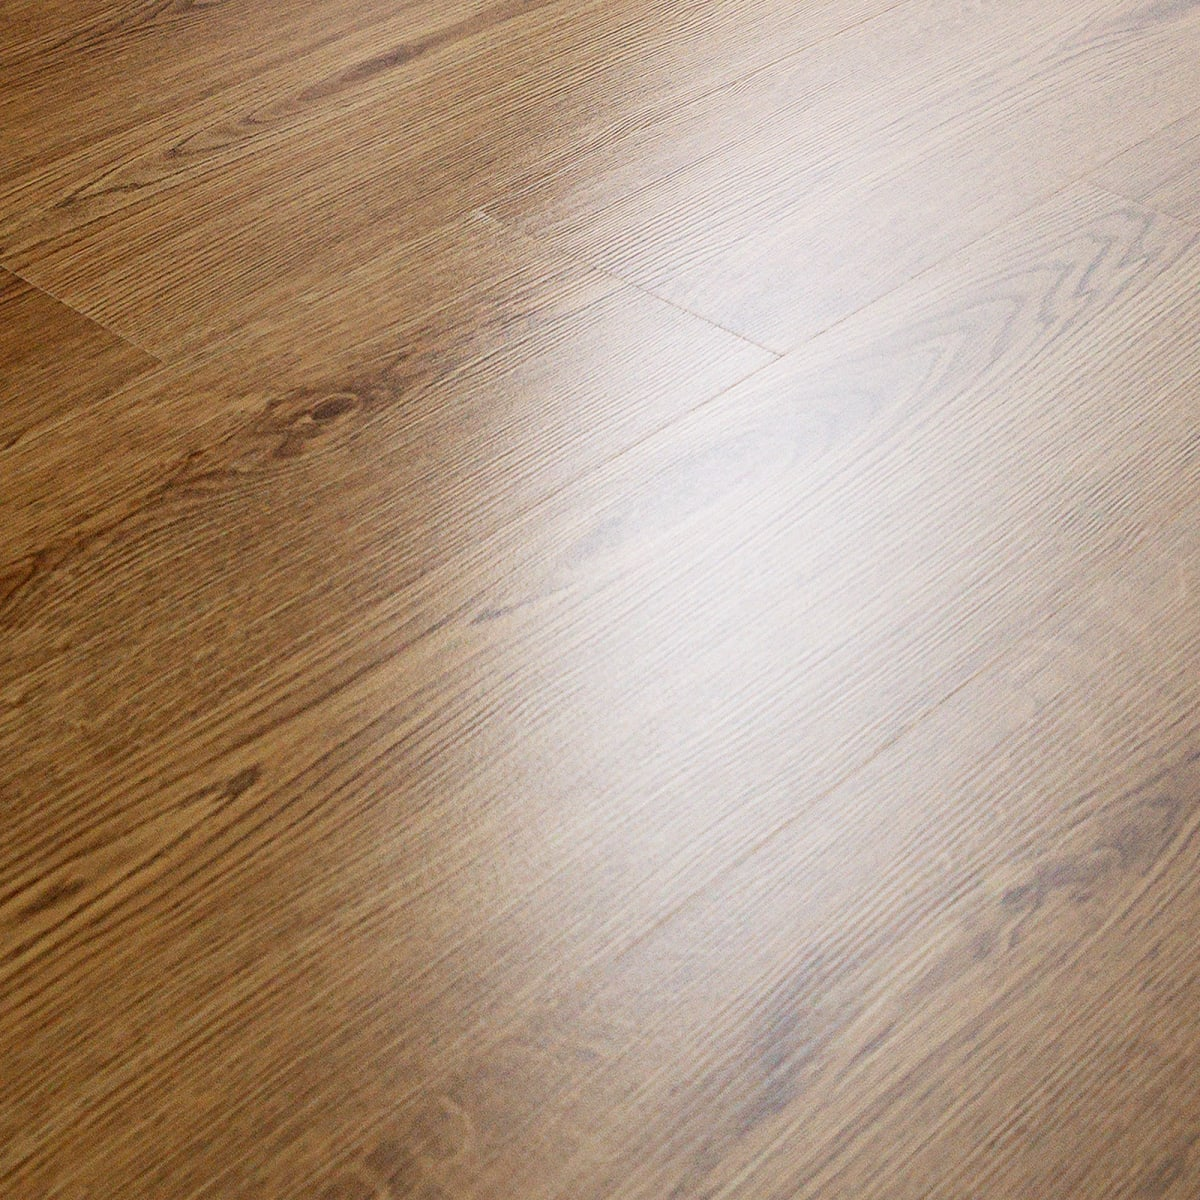 Ламинат Artens «Дуб Бристоль» 32 класс толщина 7 мм 2.397 м²